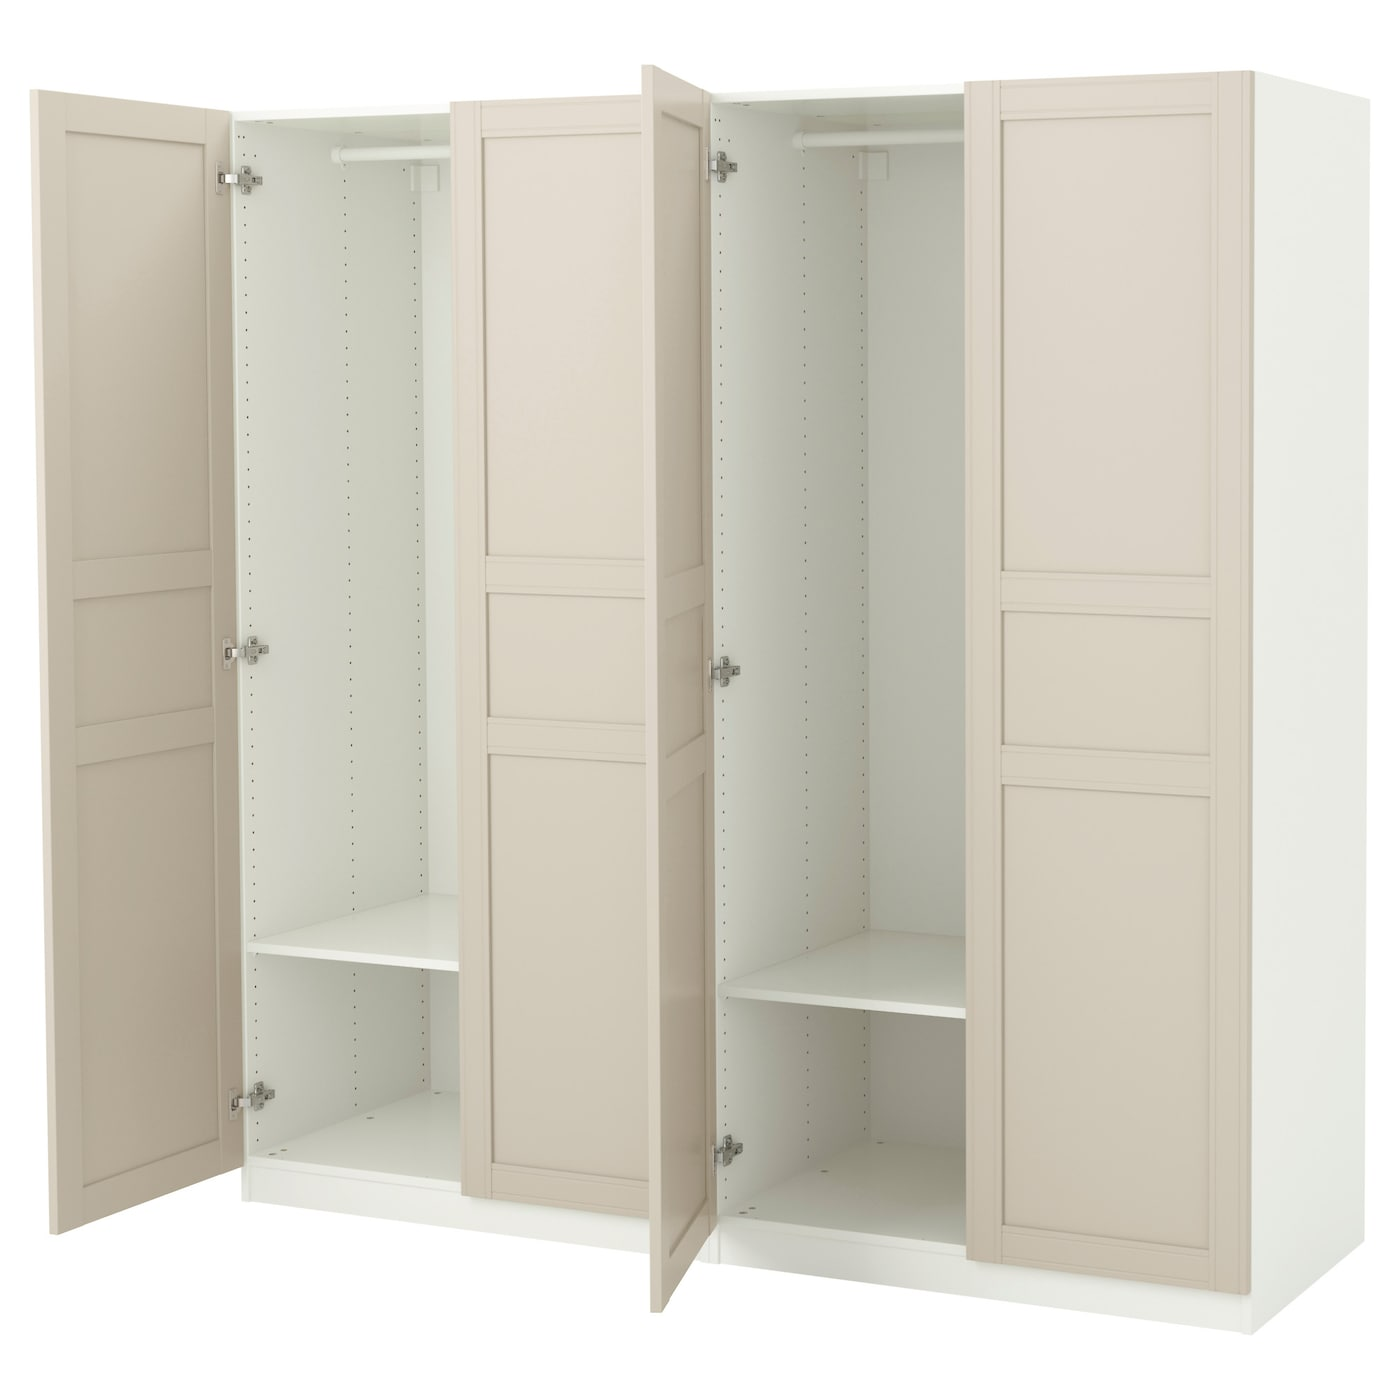 pax armoire penderie blanc flisberget beige clair 200 x 60 x 201 cm ikea. Black Bedroom Furniture Sets. Home Design Ideas